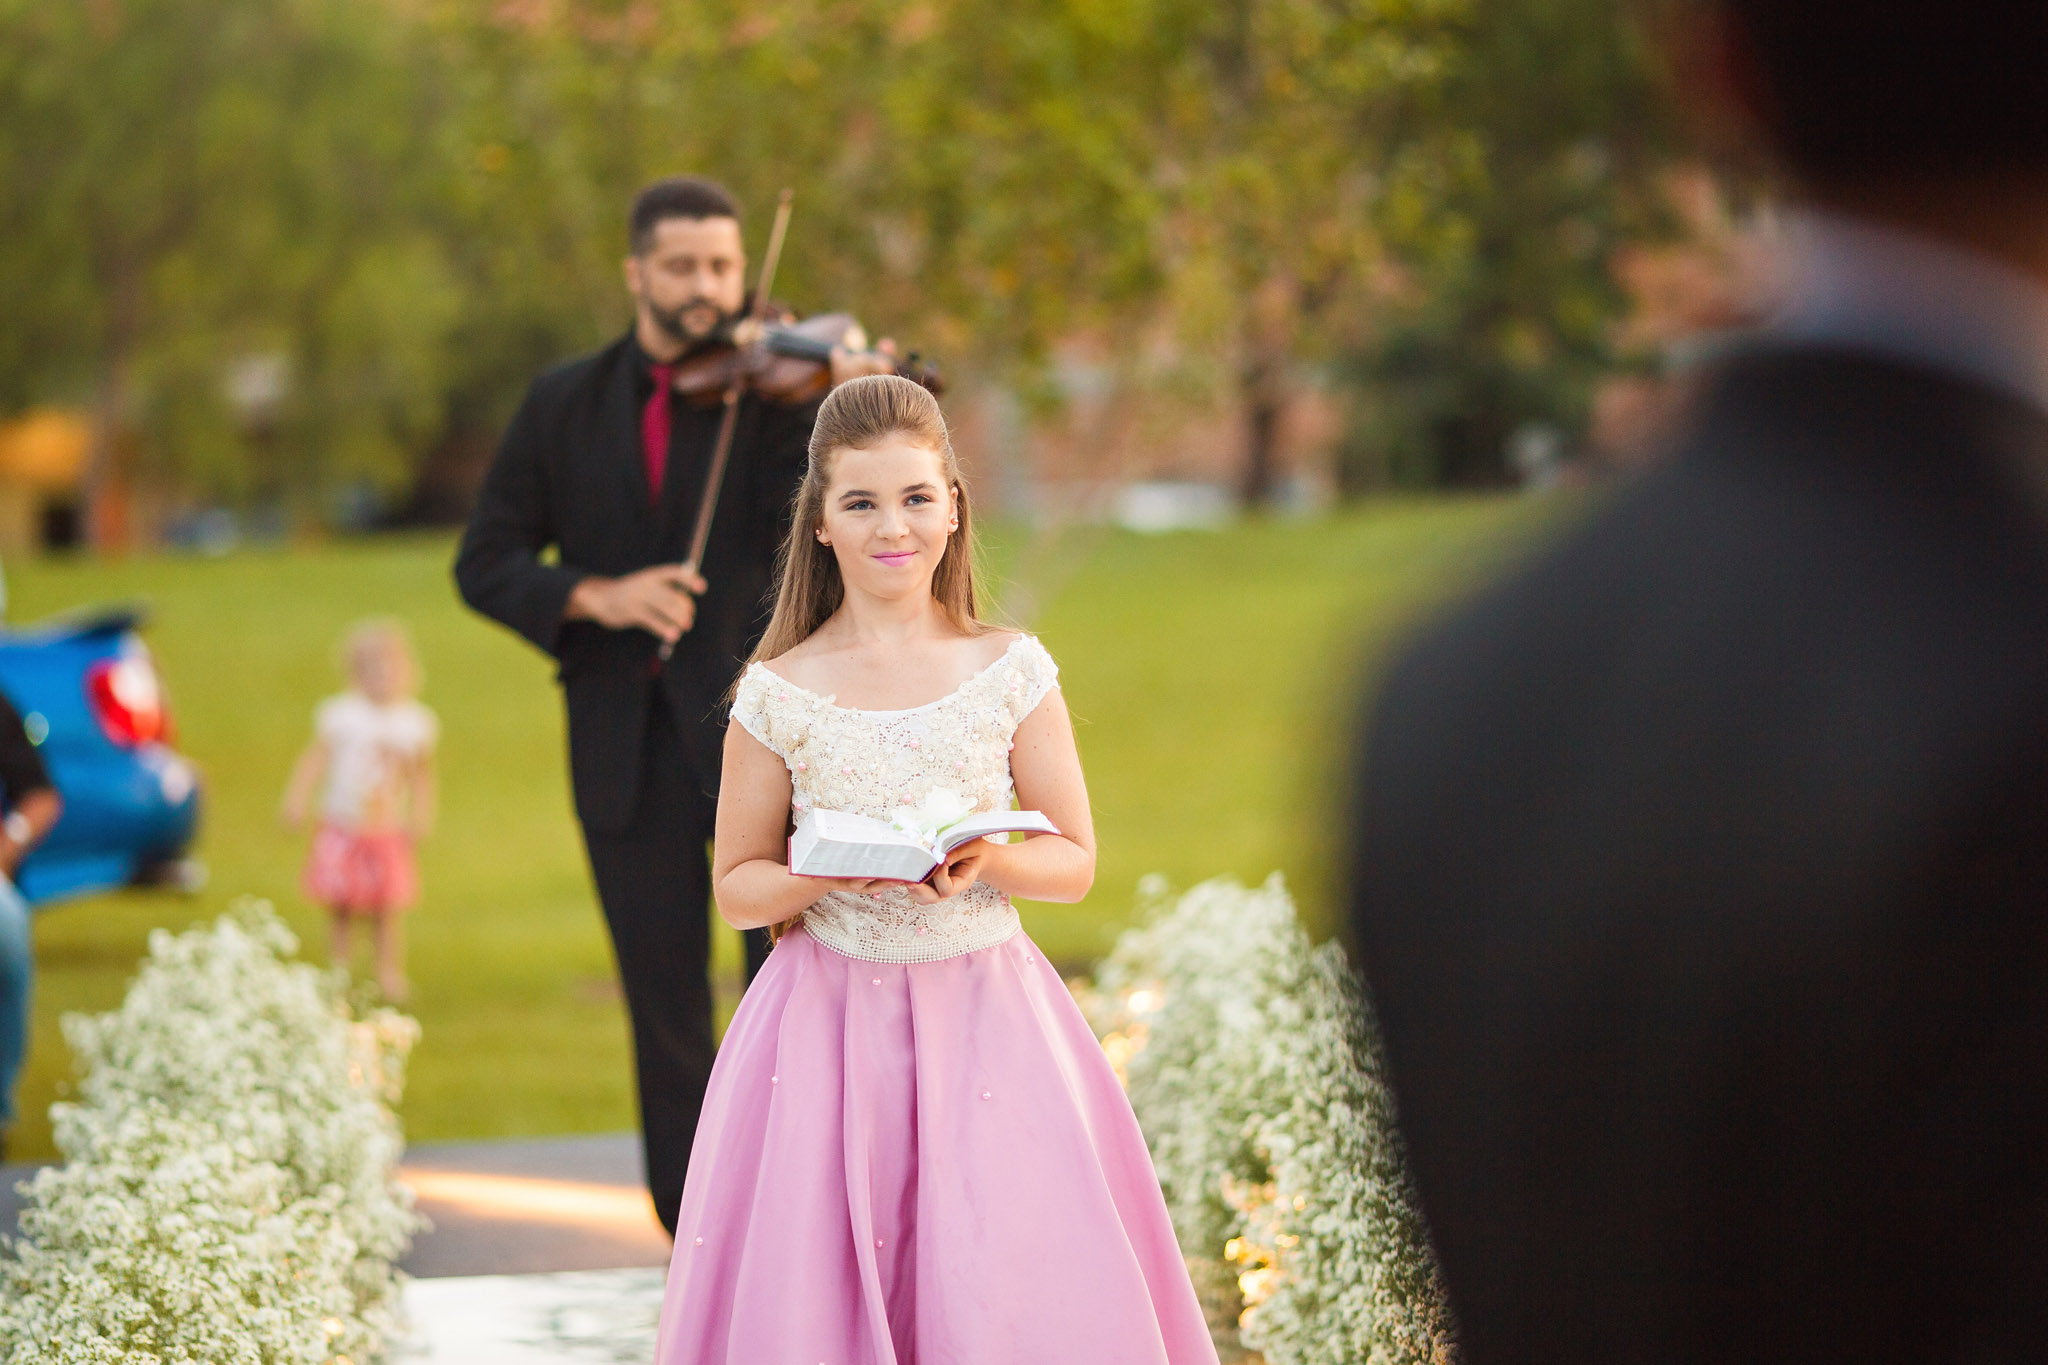 Wedding_Travellers_Destination_Wedding_Photography-114.jpg